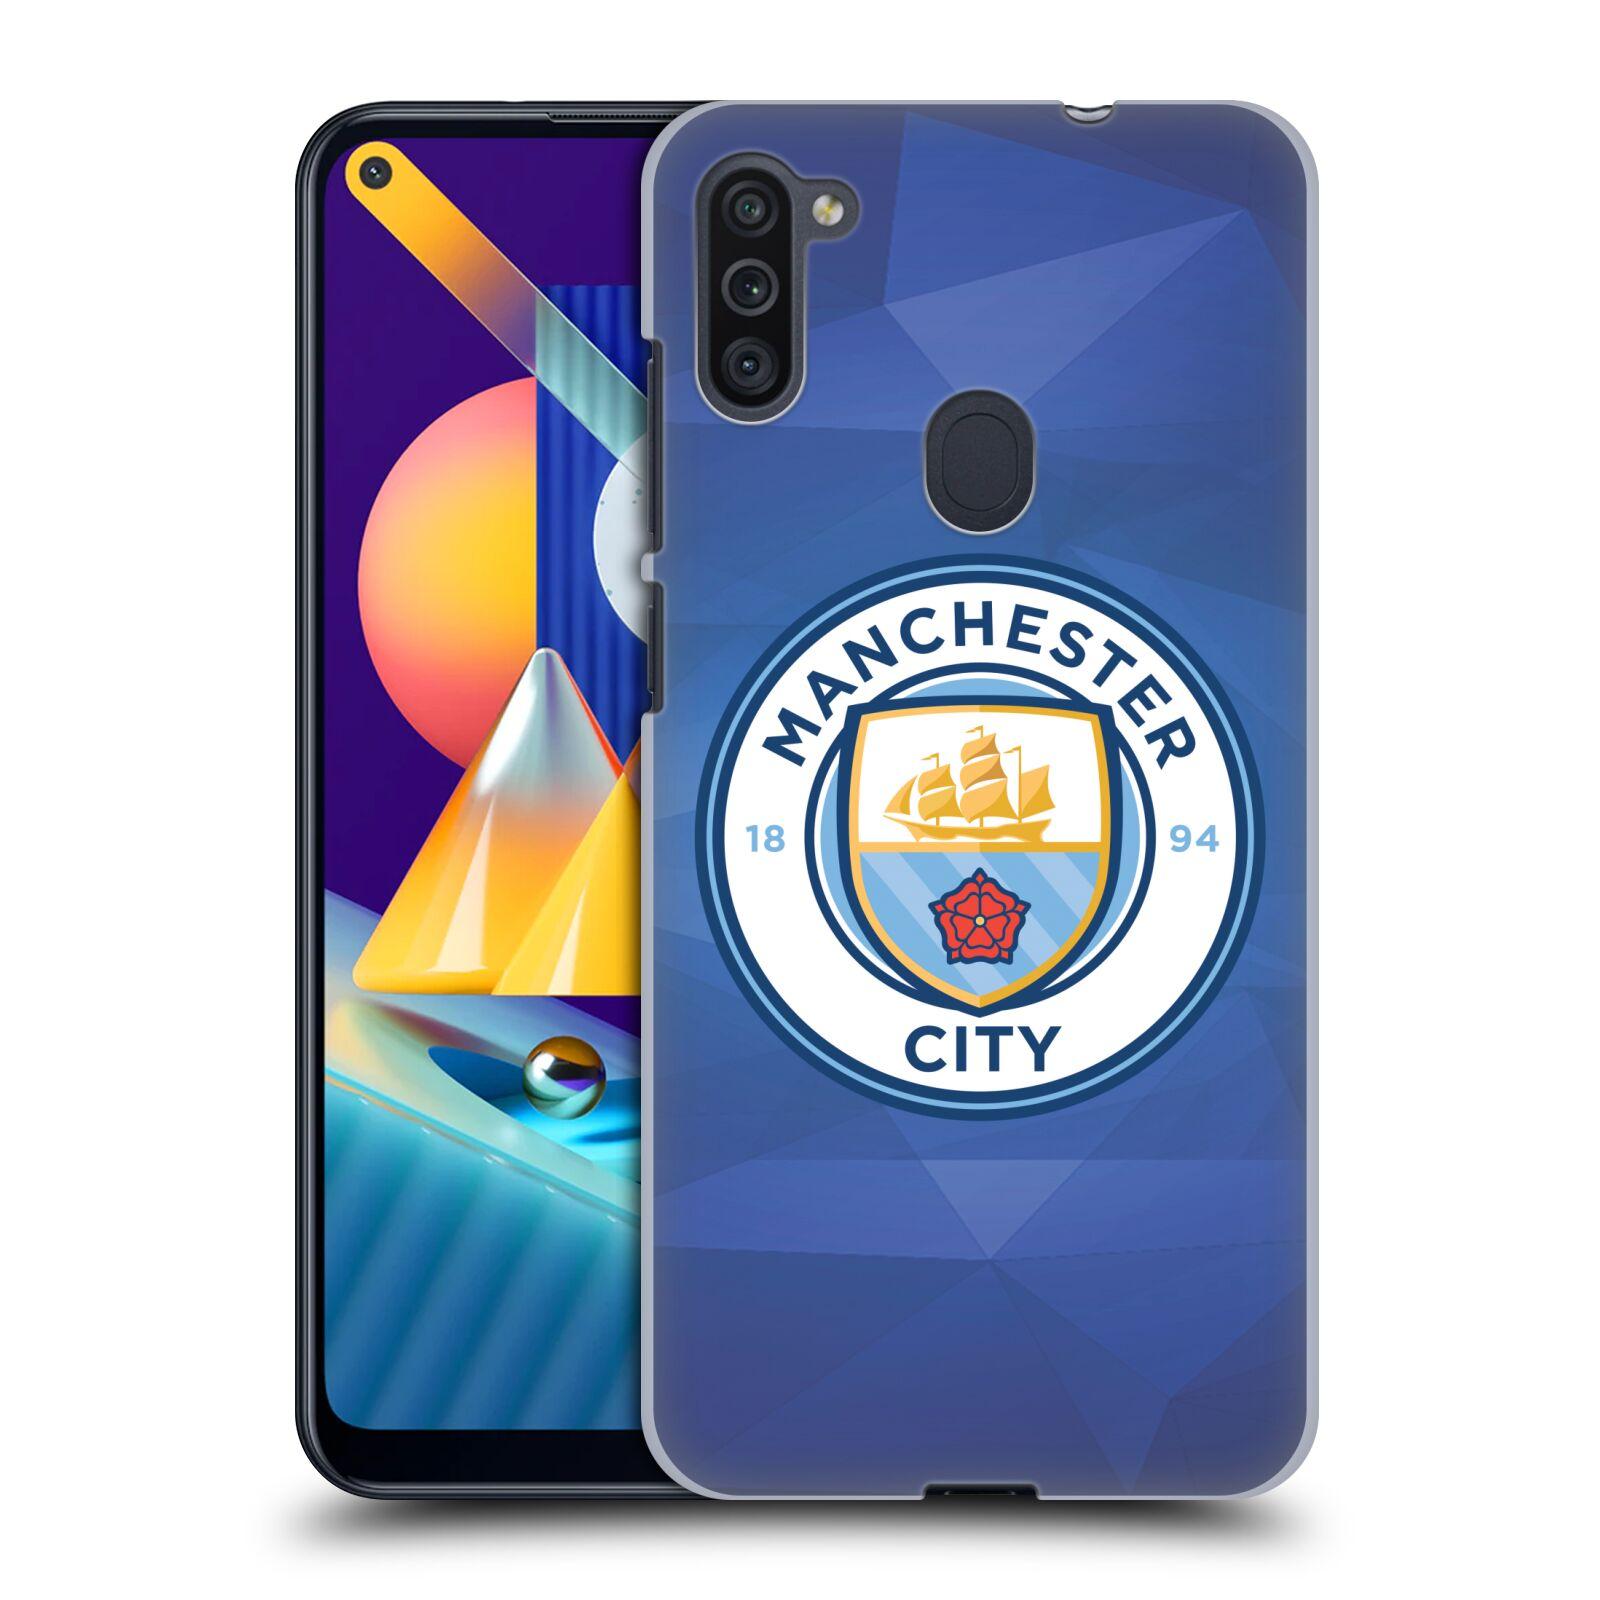 Plastové pouzdro na mobil Samsung Galaxy M11 - Head Case - Manchester City FC - Modré nové logo